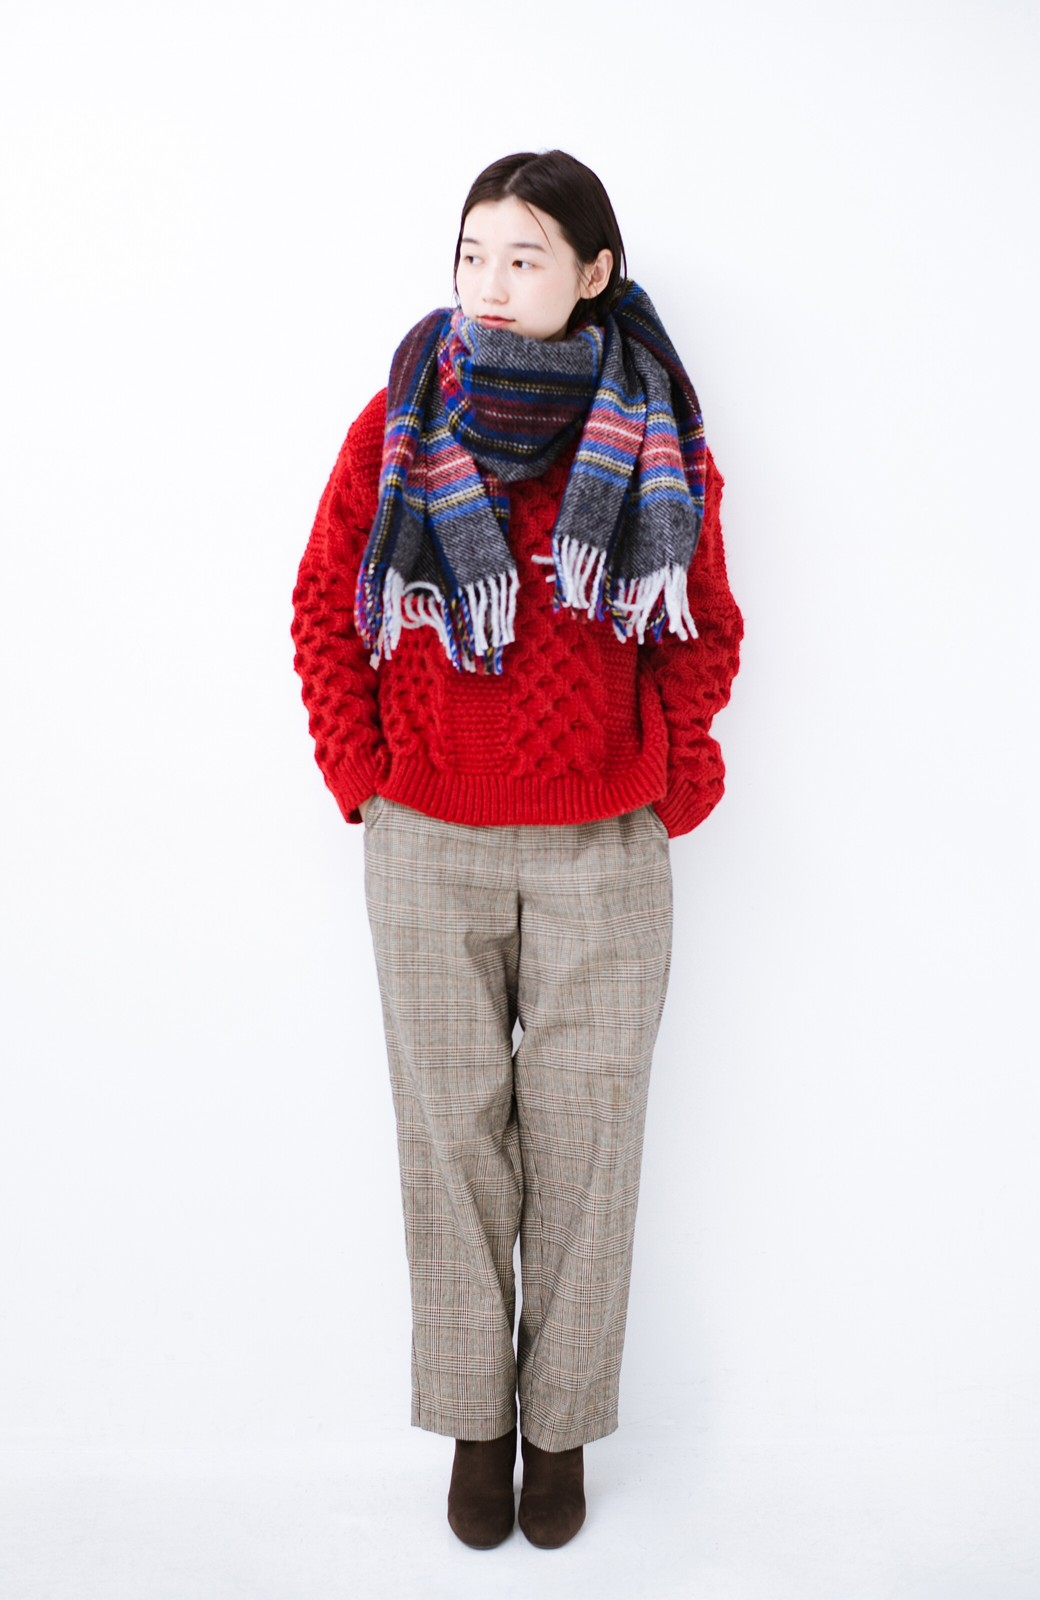 haco! 古着っぽい雰囲気がこなれたパネル編みケーブルニット <レッド>の商品写真8